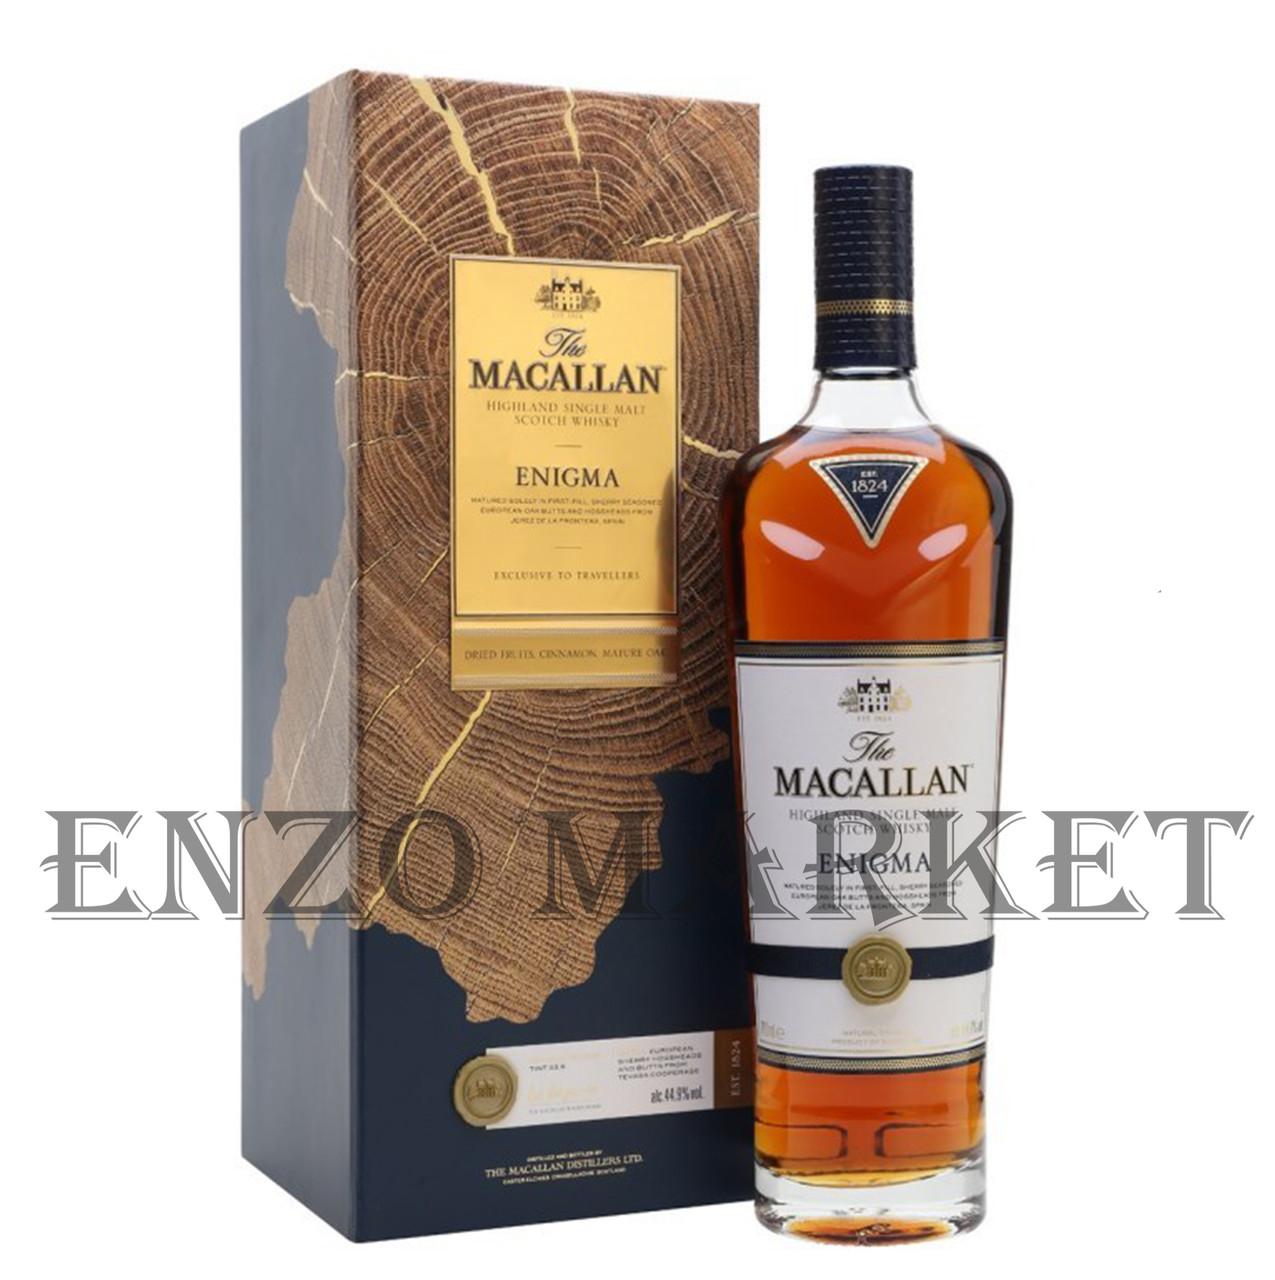 Виски Macallan Enigma (Макаллан Энигма) 44.9%, 0,7 литра